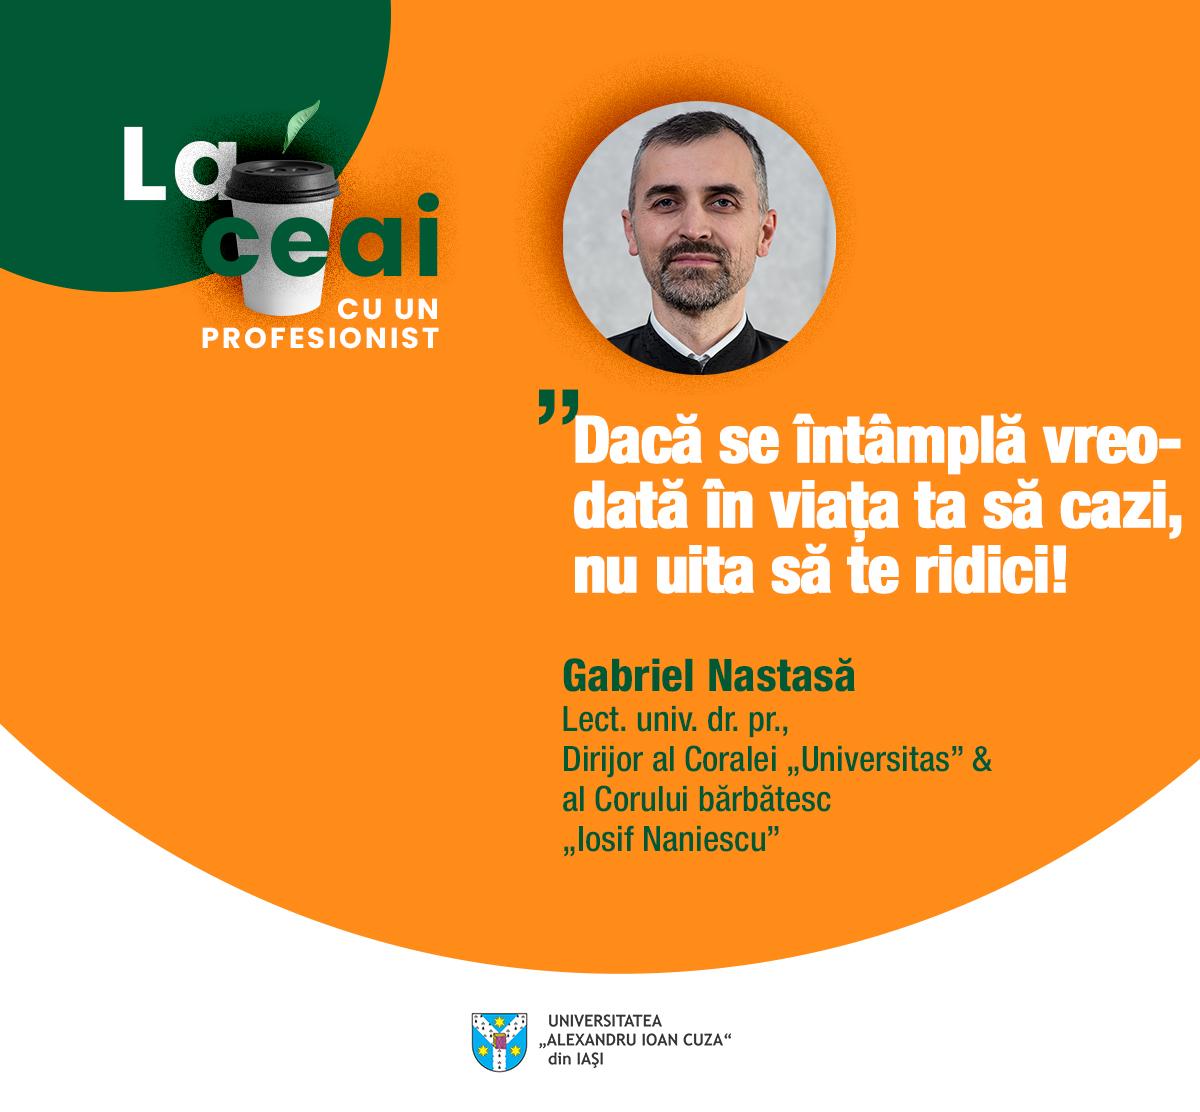 Gabriel Nastasa – La ceai cu un profesionist UAIC